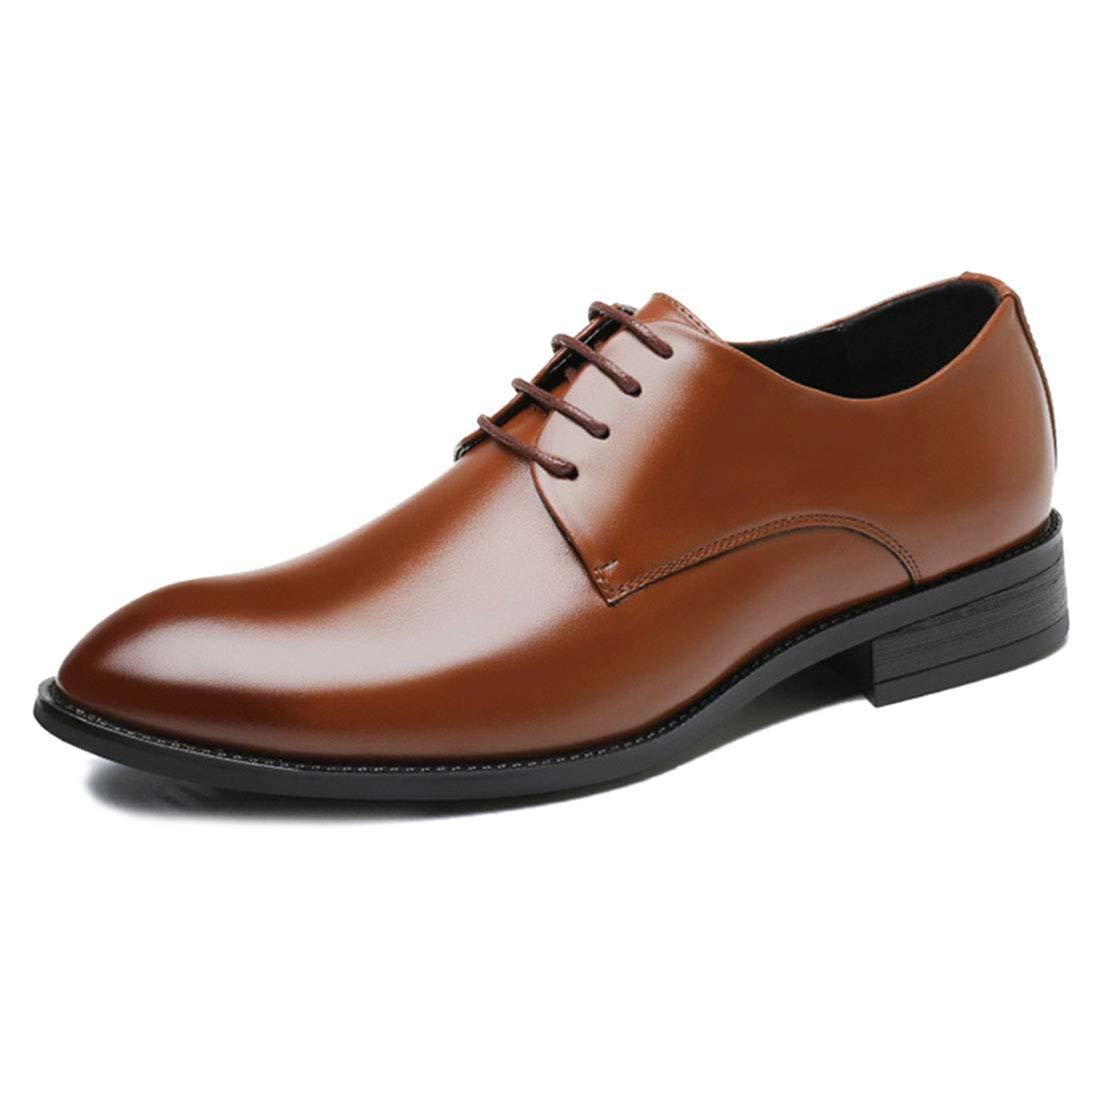 Jiyaru Mens Lace Up Oxford Shoes Formal Dress Business Flats Brown Asian 41 / US 8